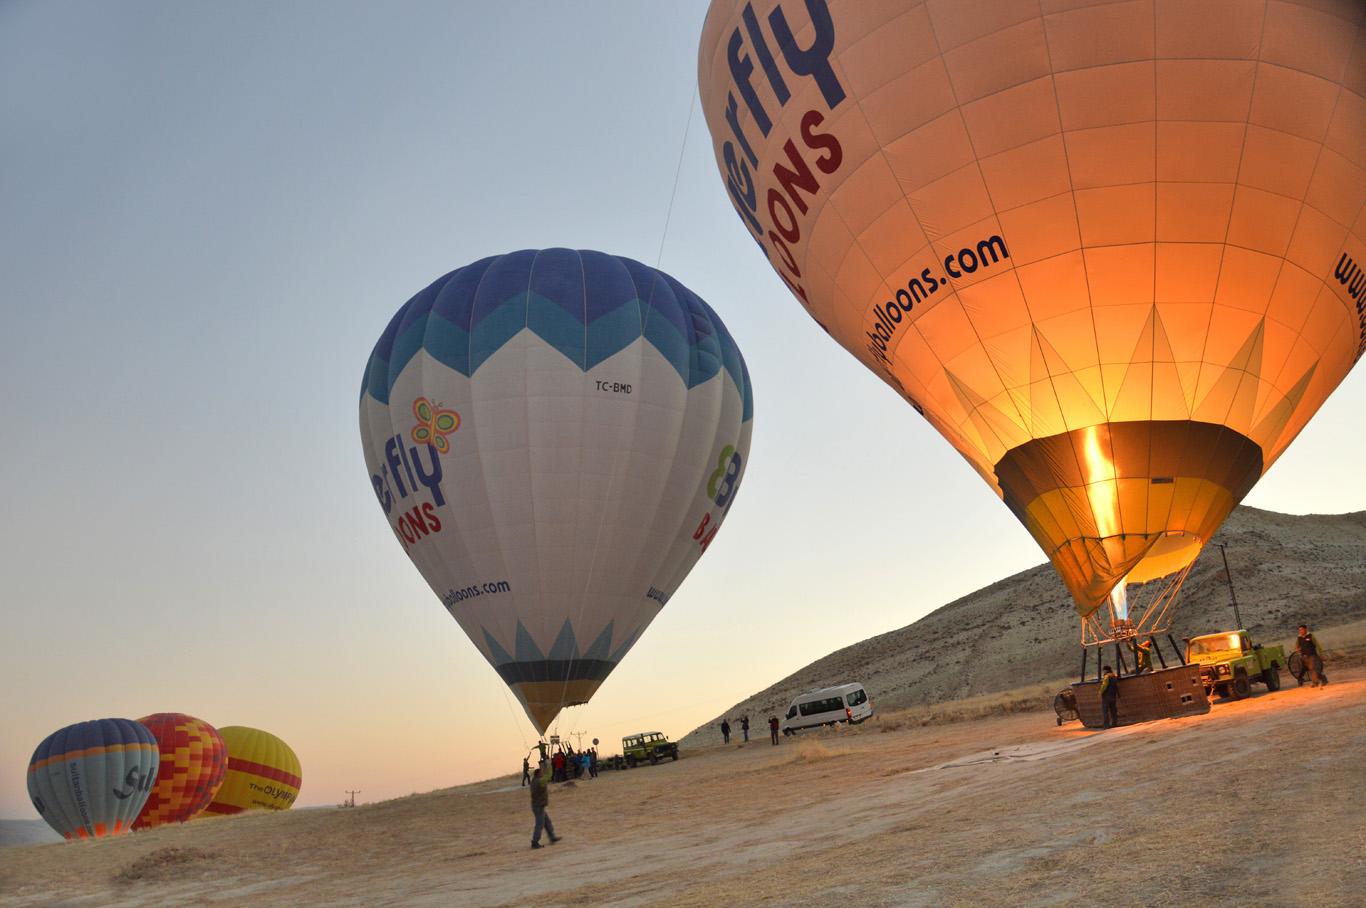 Balloons ready to take off